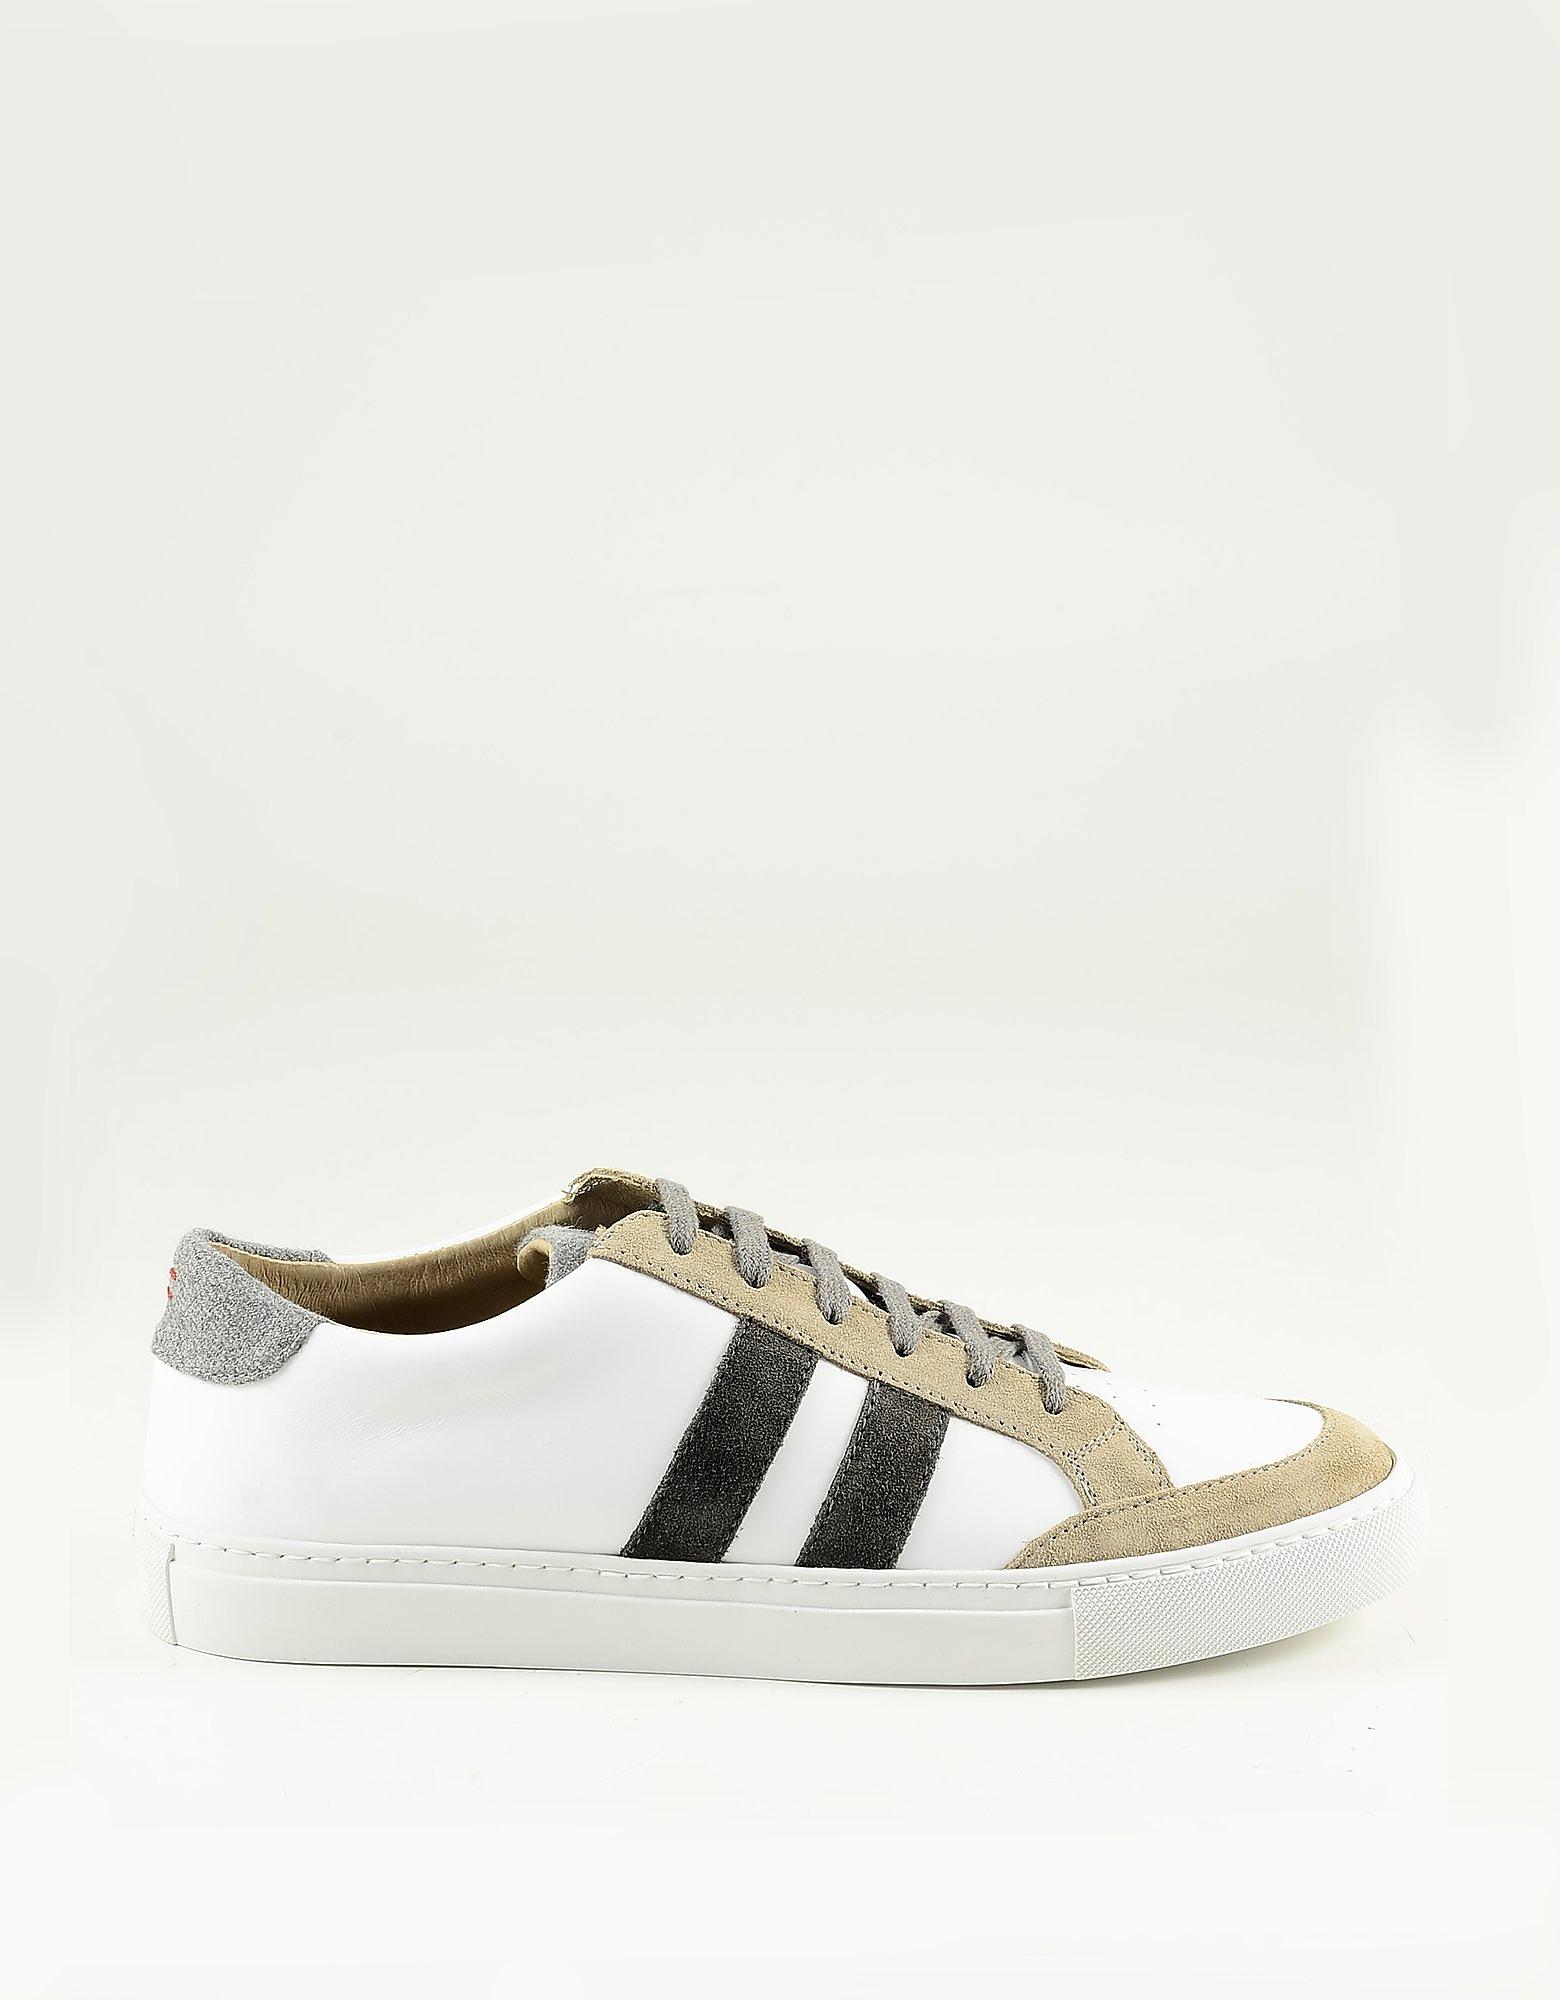 Eleventy Designer Shoes, White / Brown Men's Sneakers